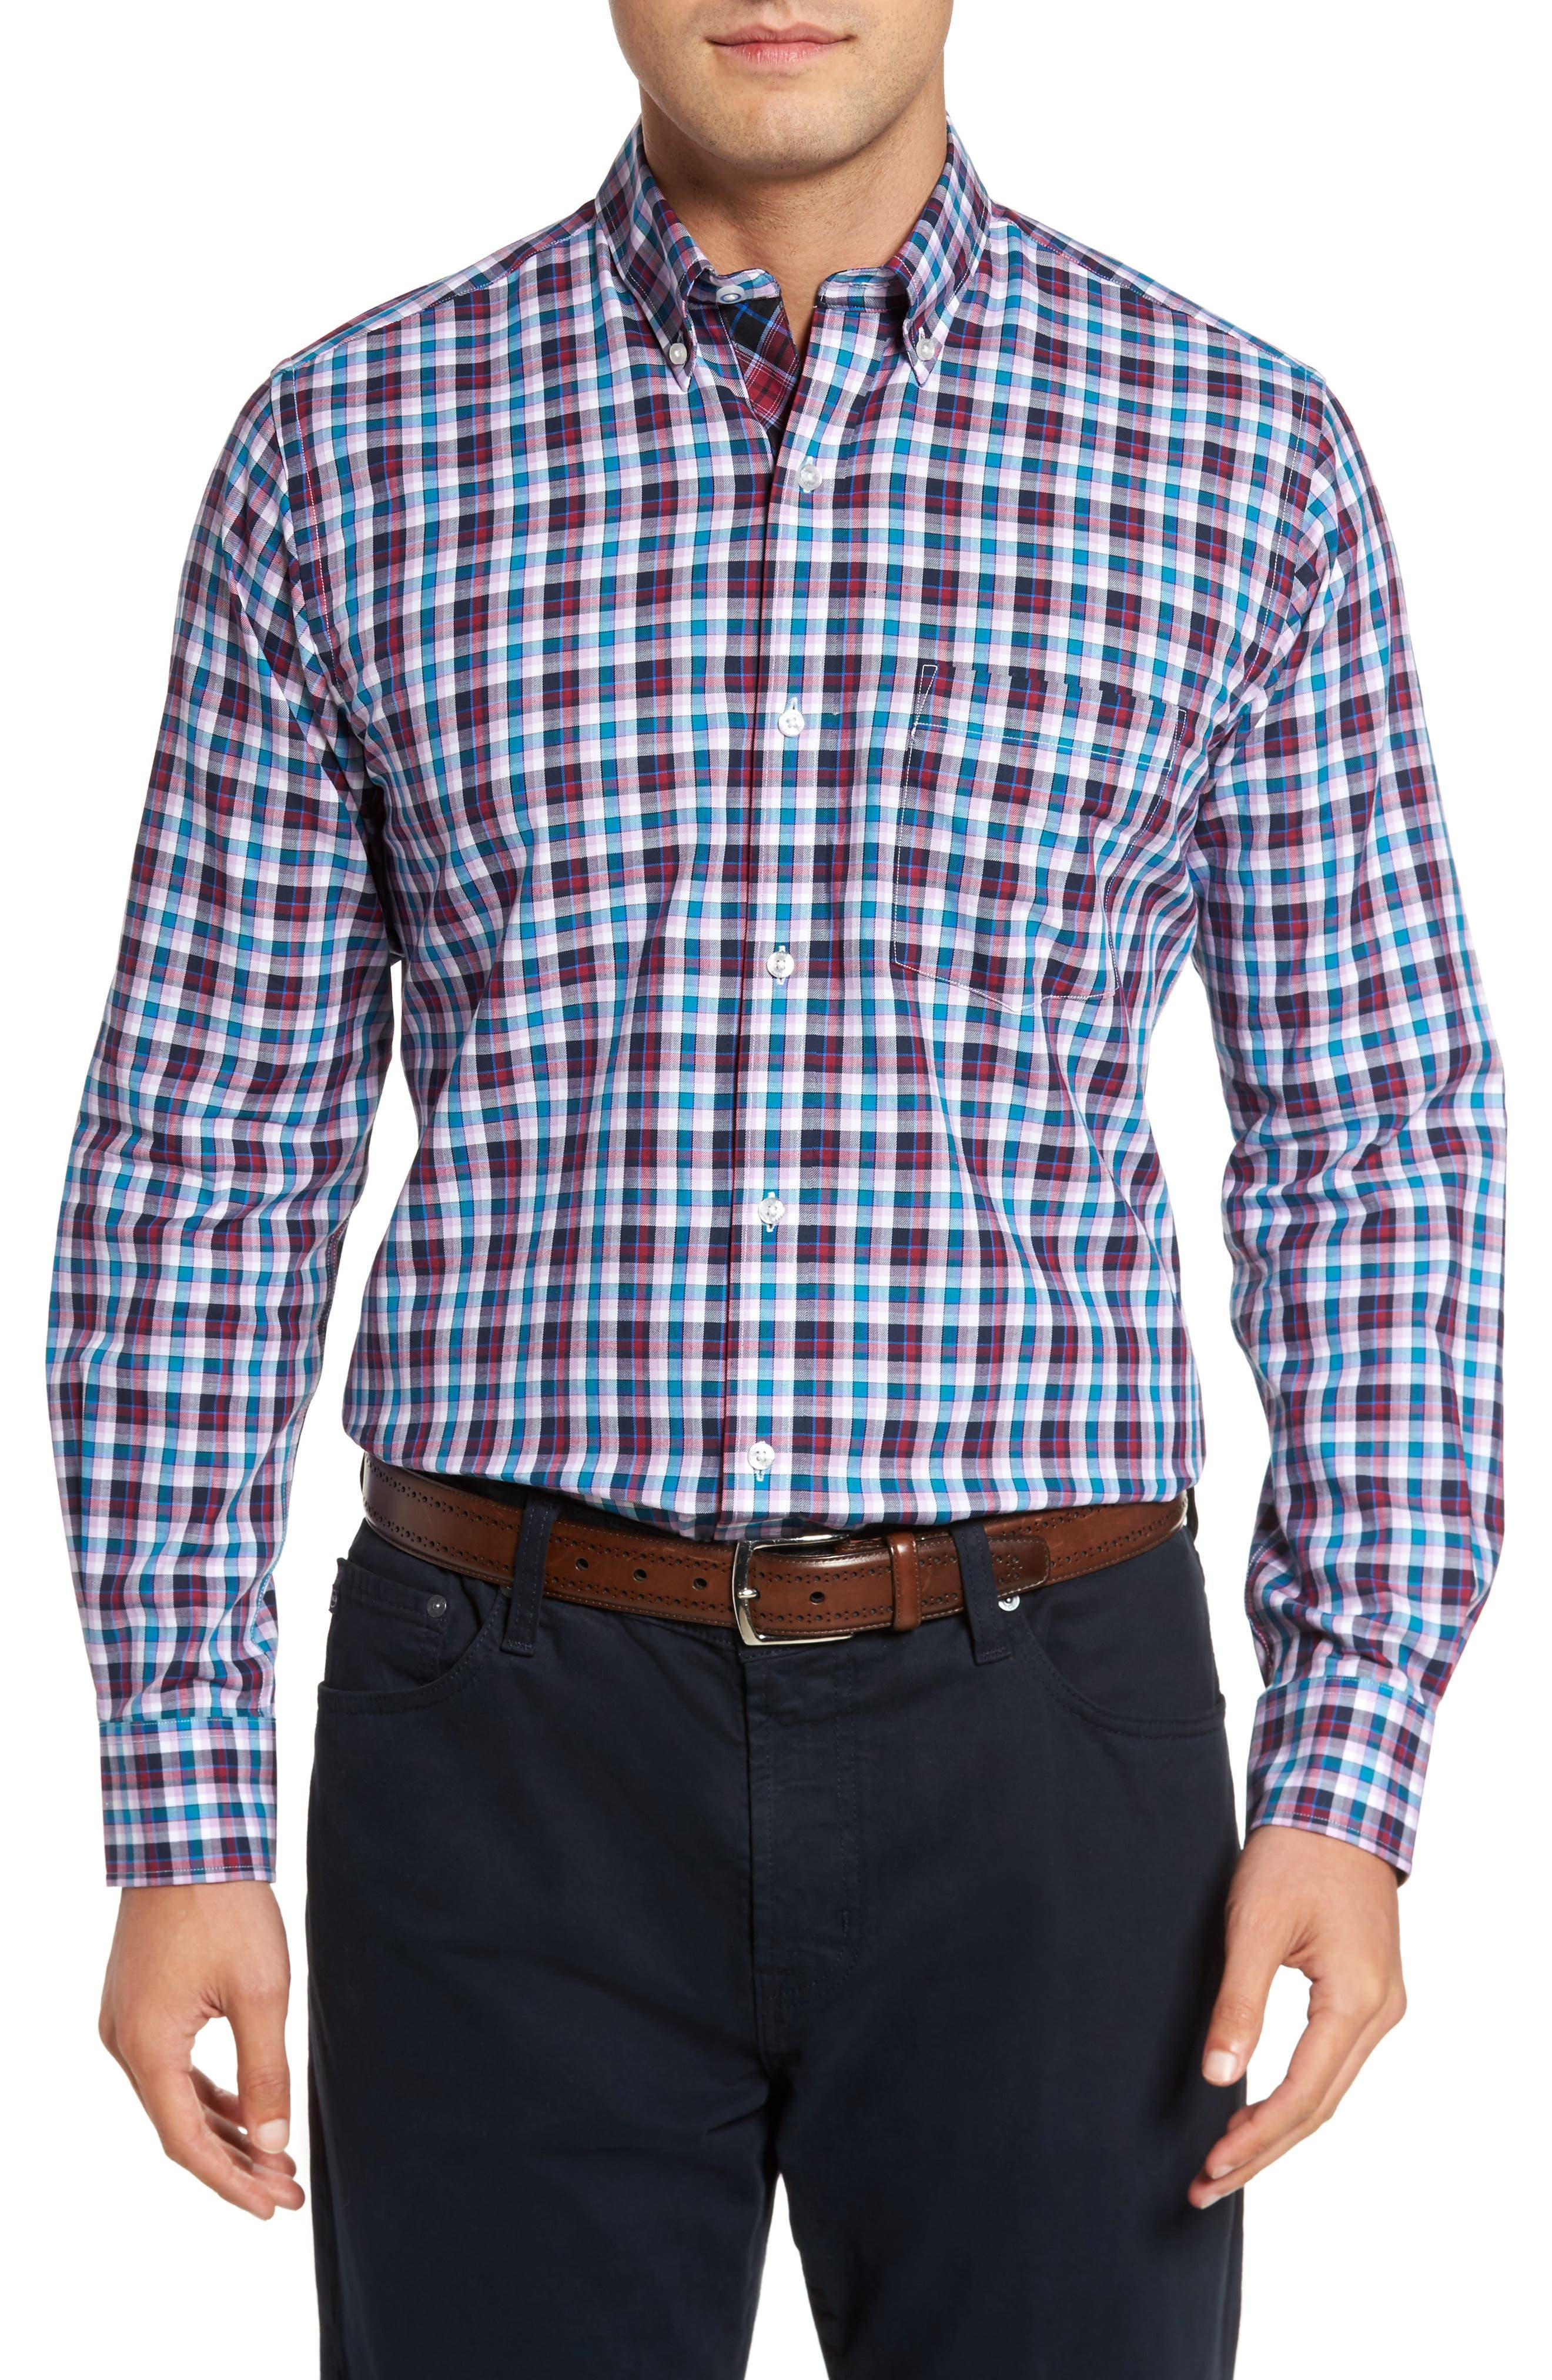 Alternate Image 1 Selected - TailorByrd Coushatta Plaid Sport Shirt